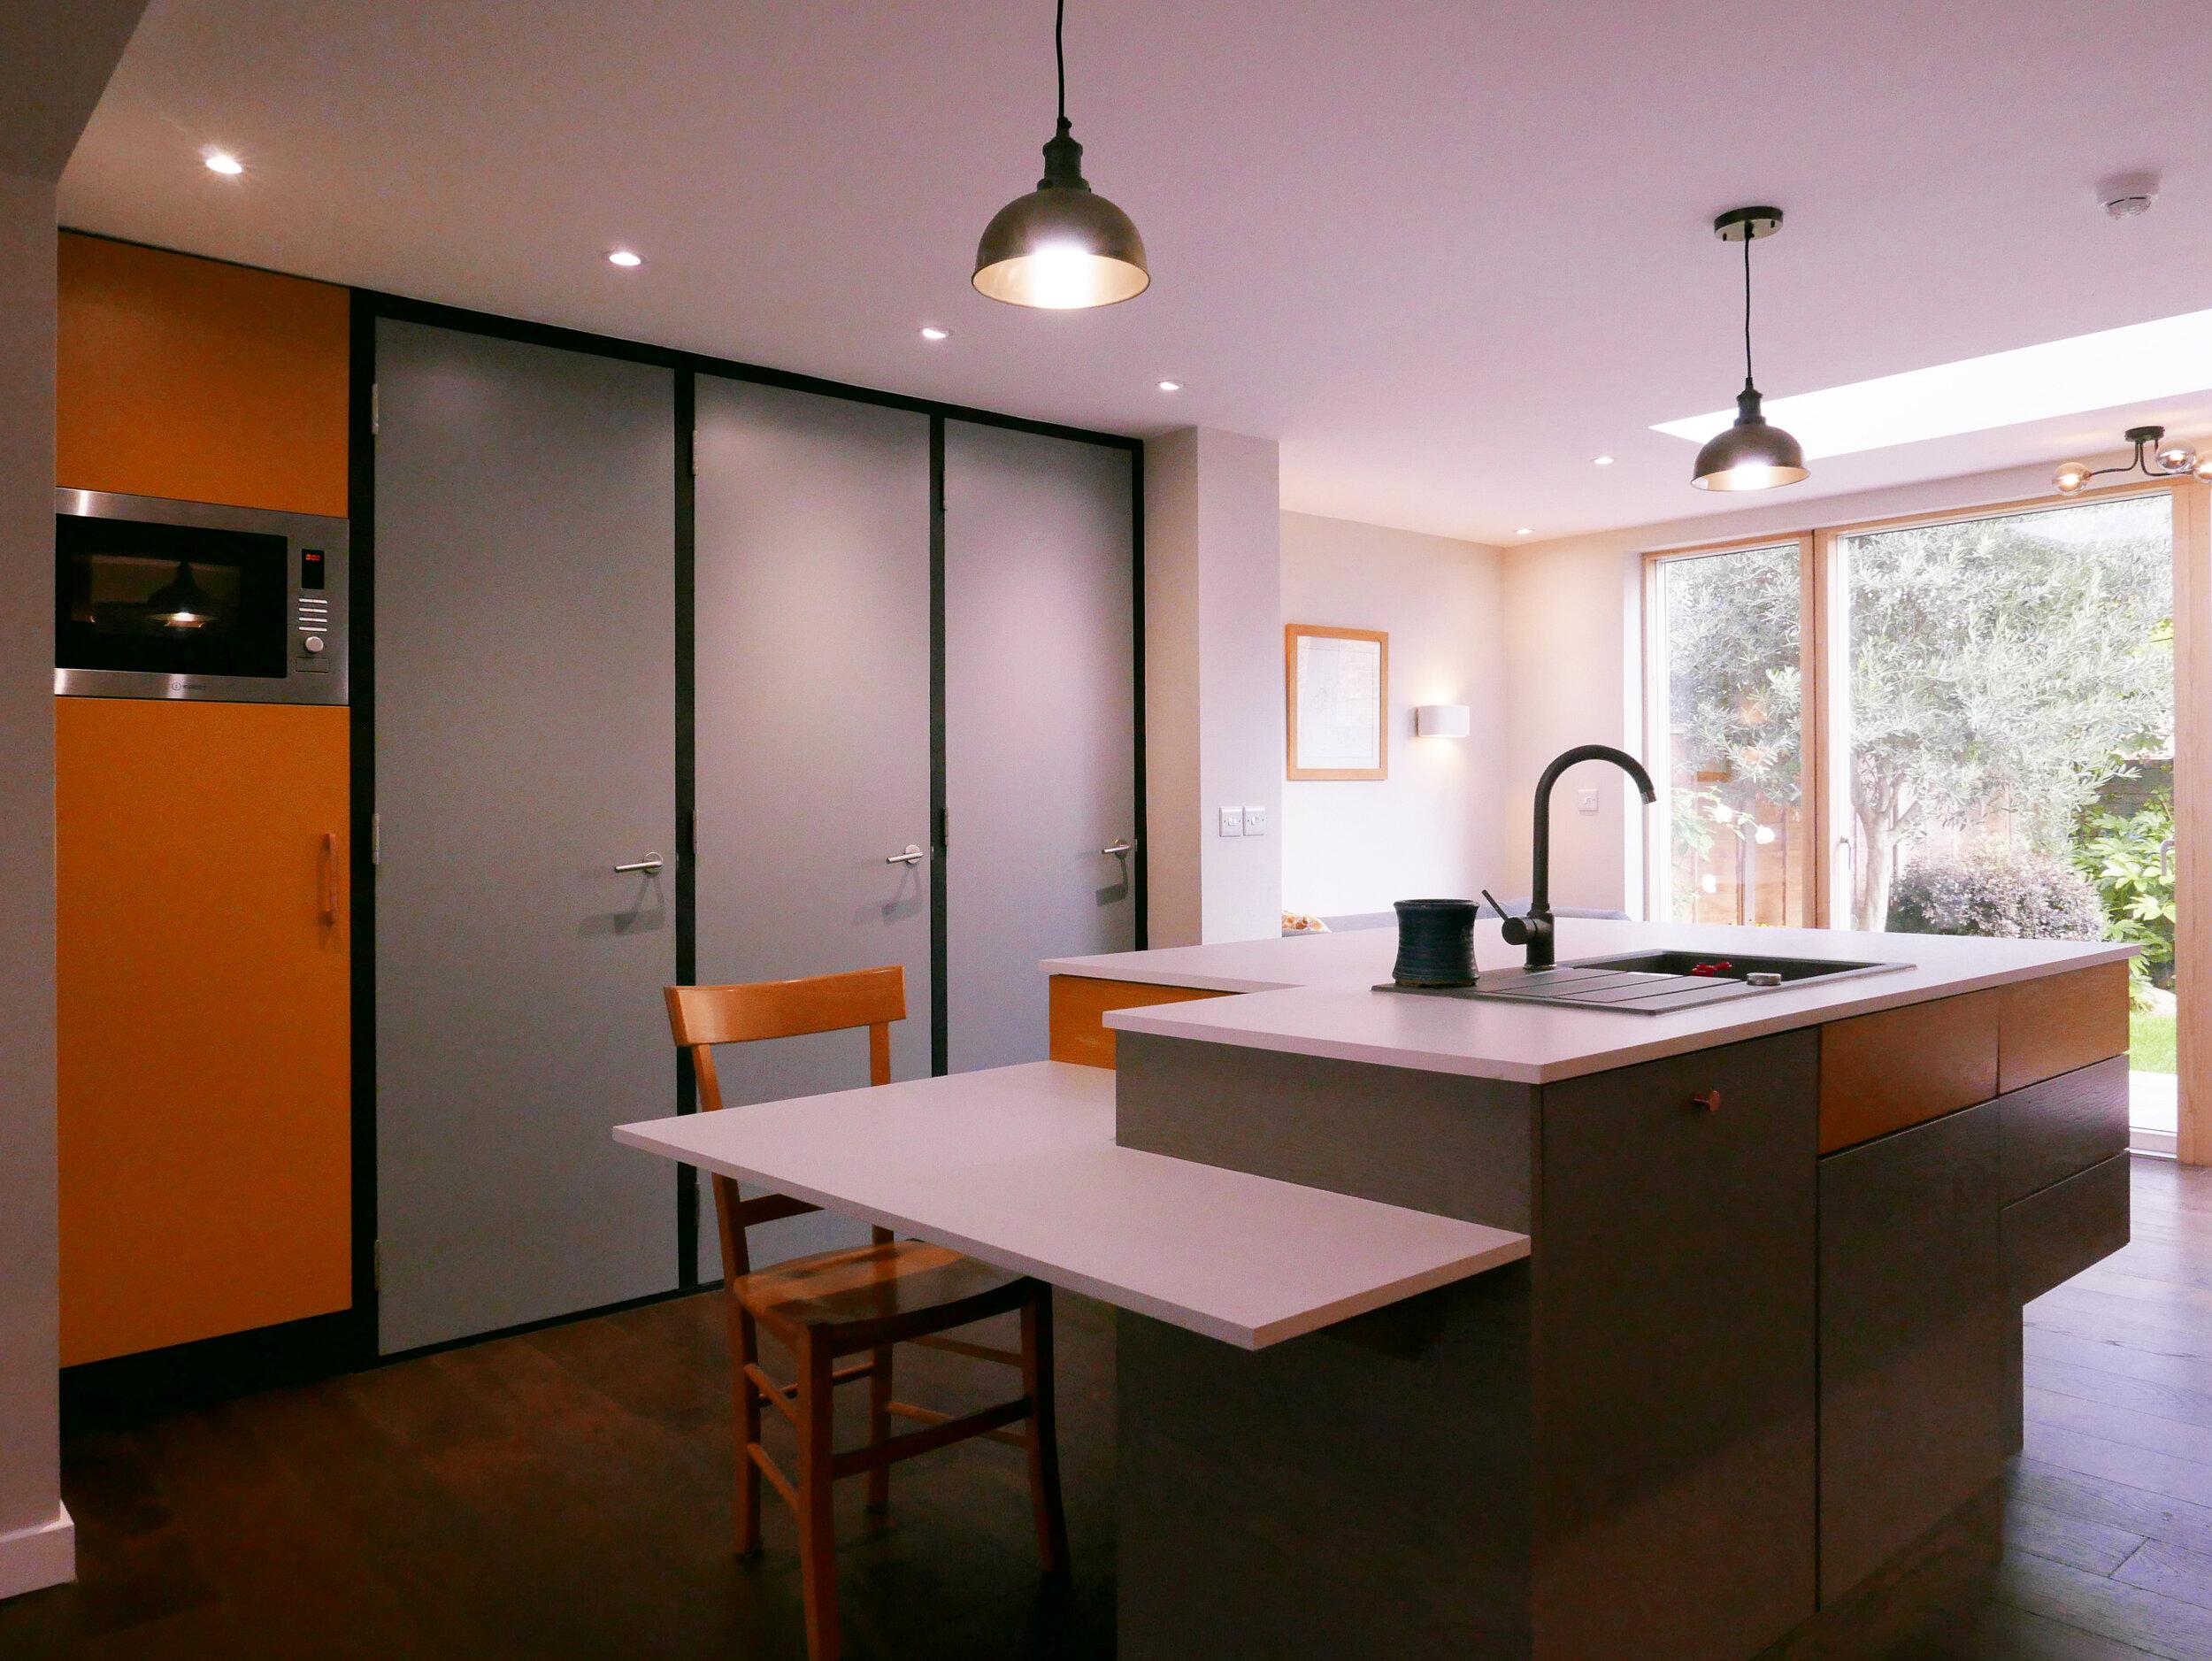 RetroFirst Ergonomically Designed Island Unit Re-clad Fire Doors Integrated Fridge